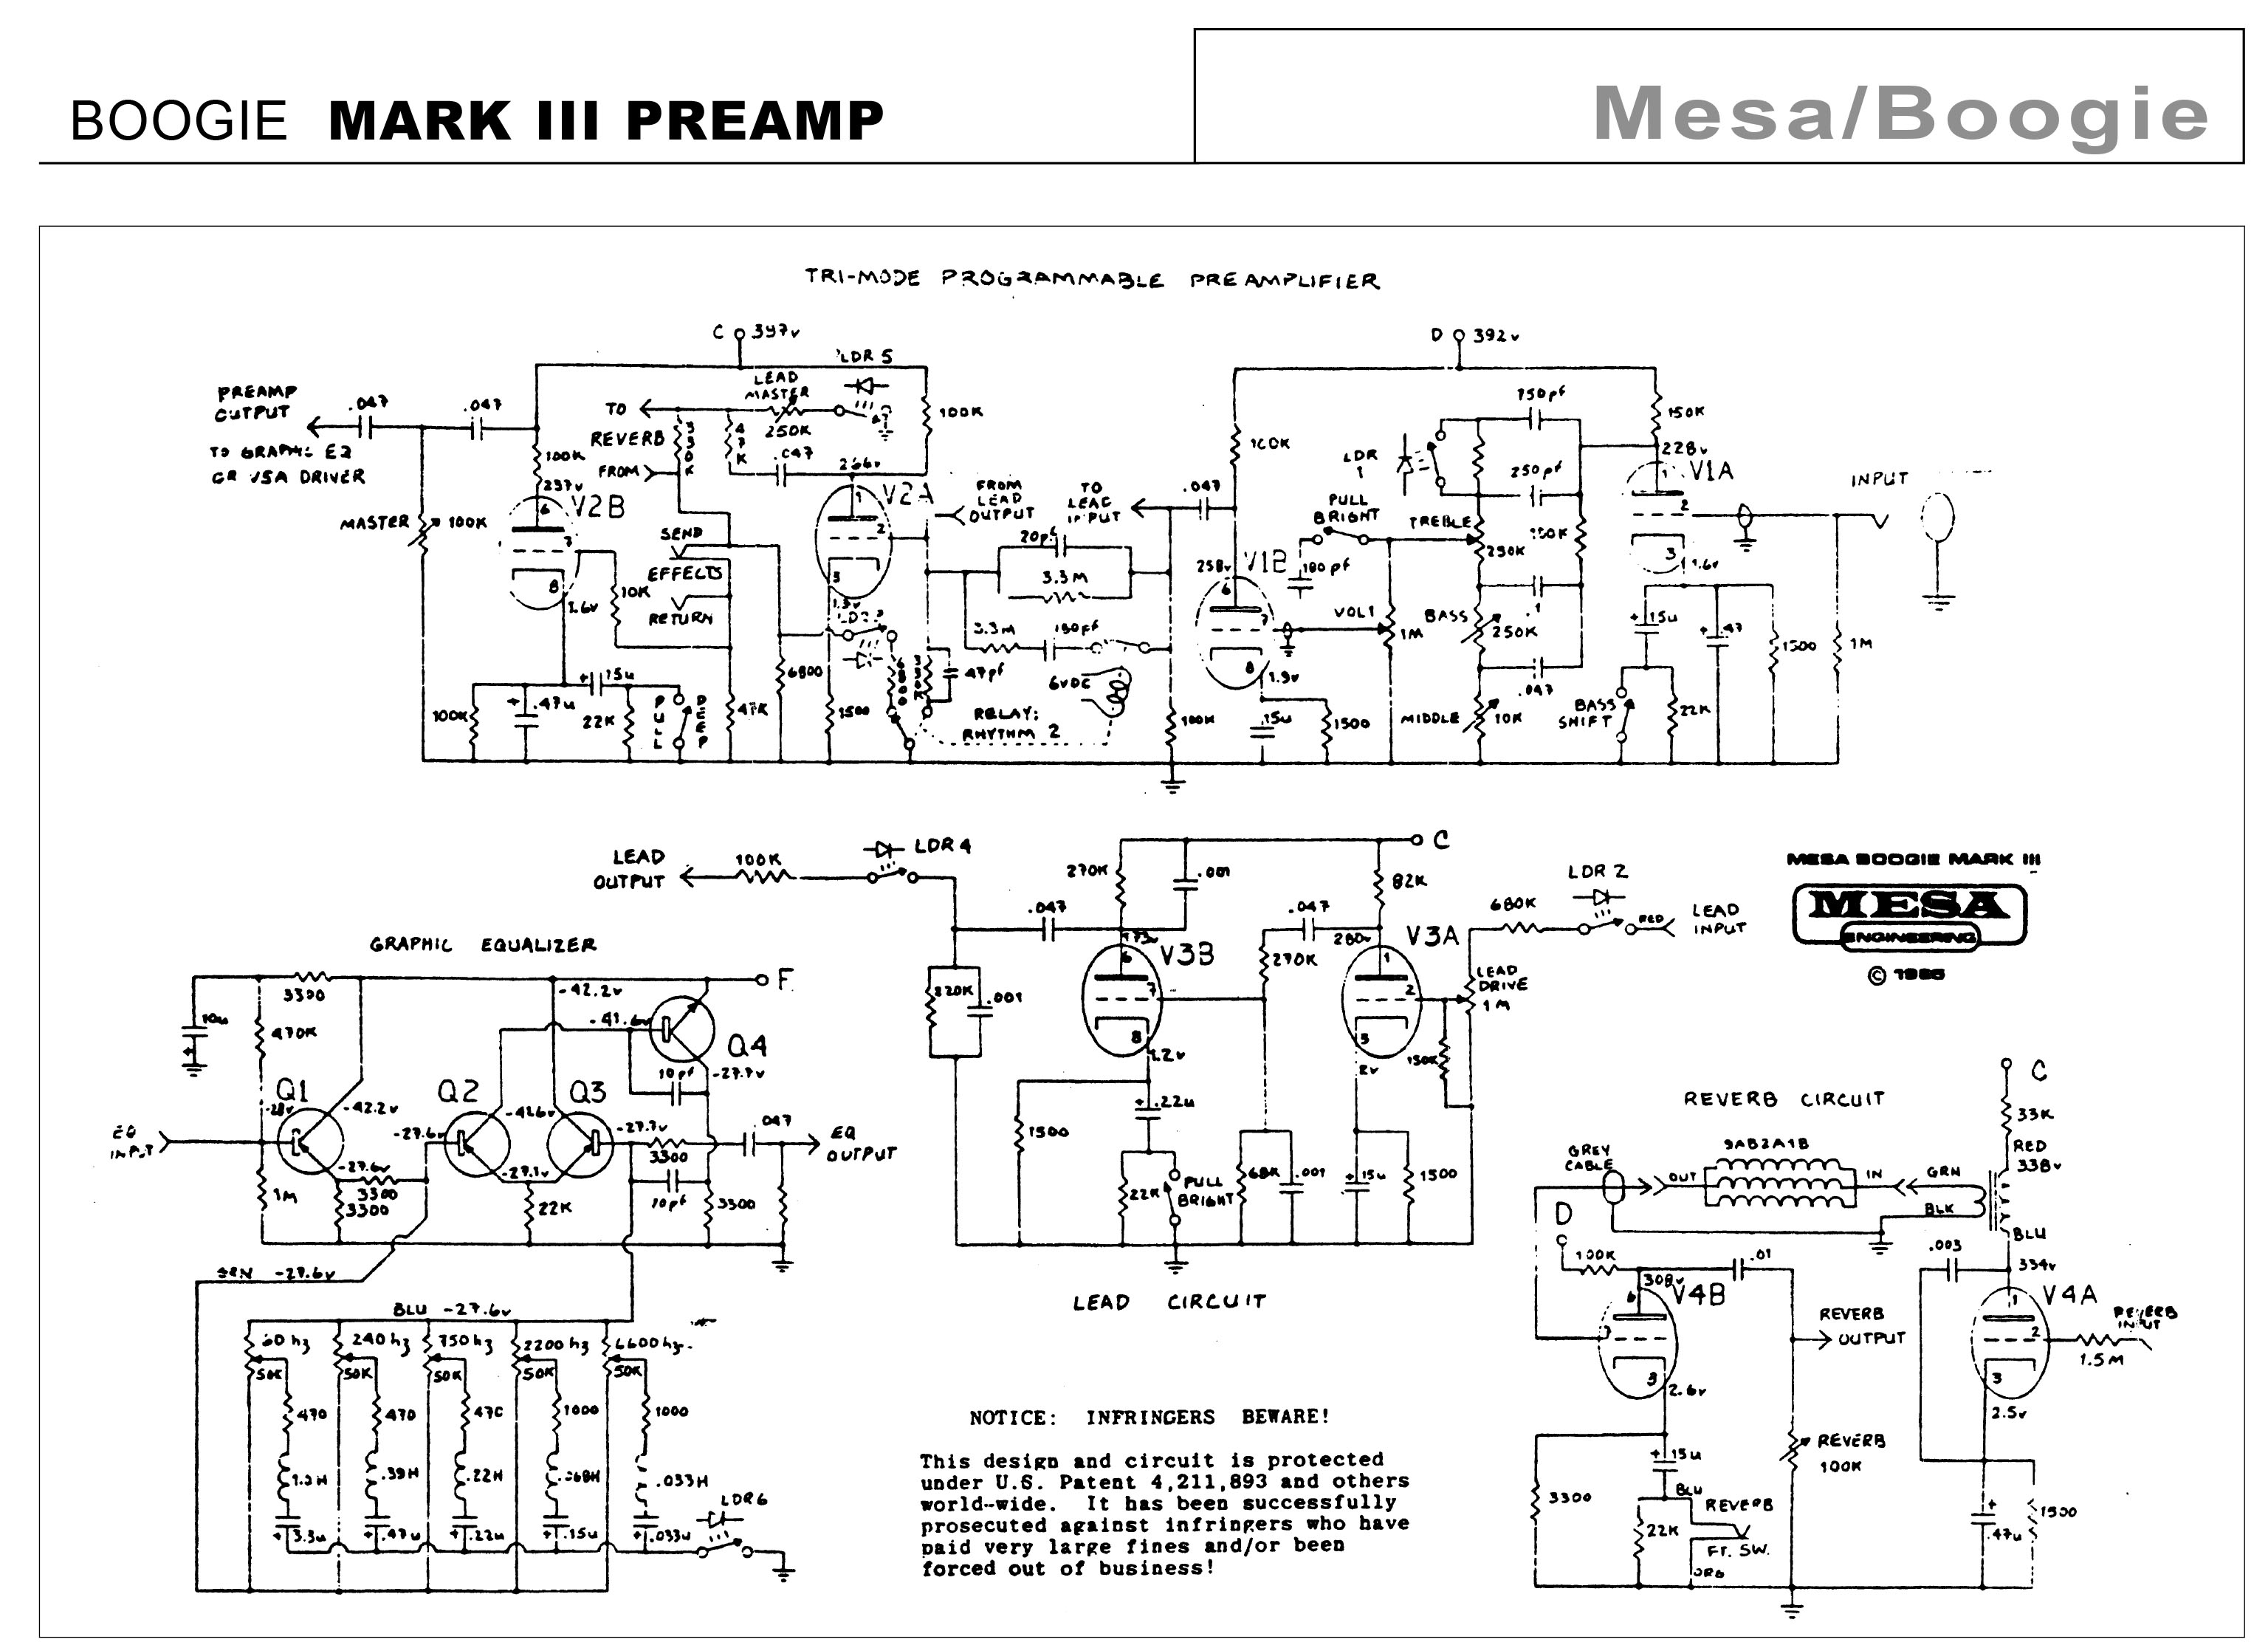 MESA BOOGIE MARK III SCHEMATIC PDF DOWNLOAD